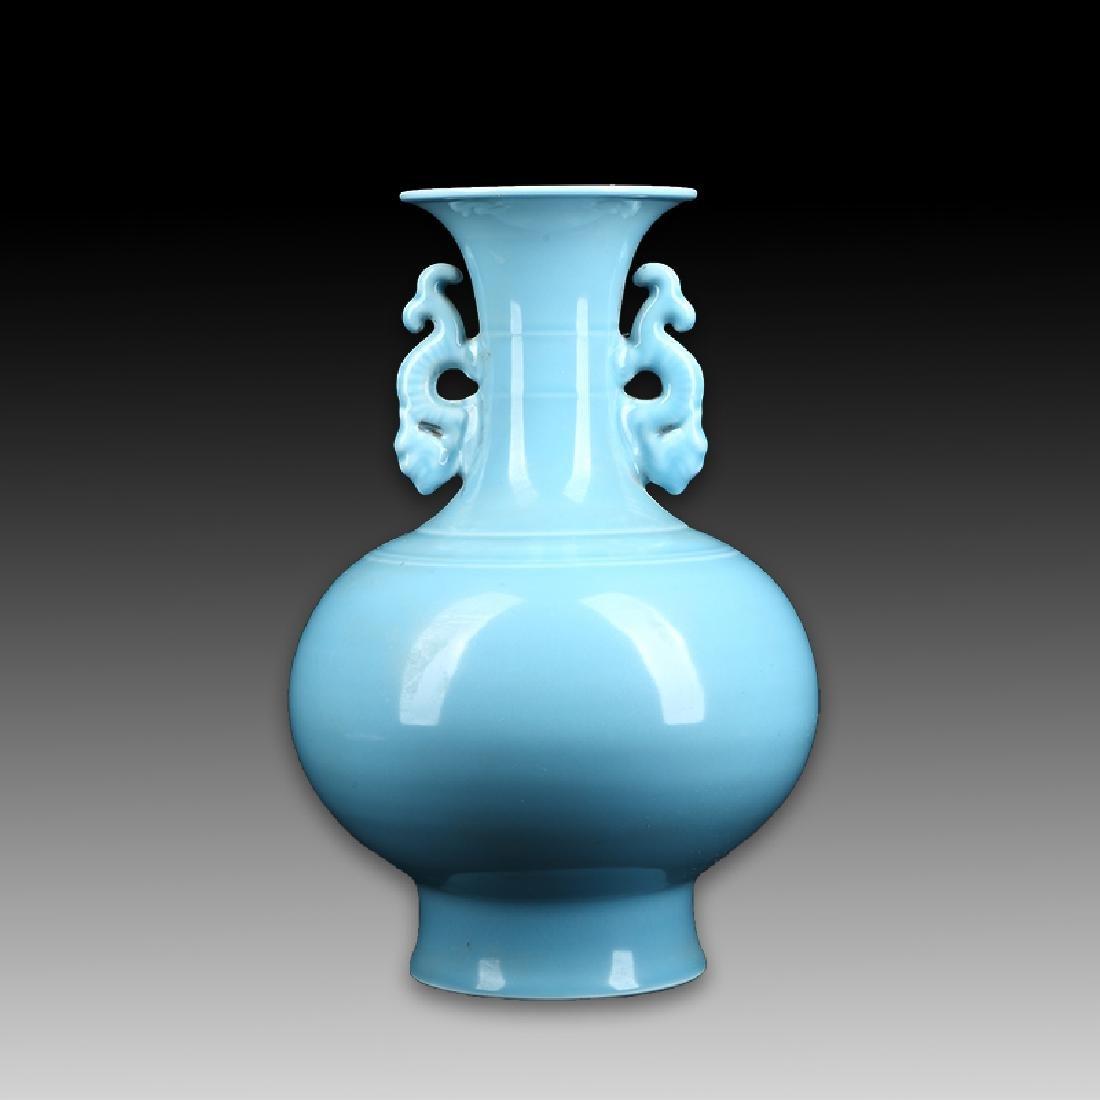 Chinese Pale Celadon Porcelain Bottle Vase